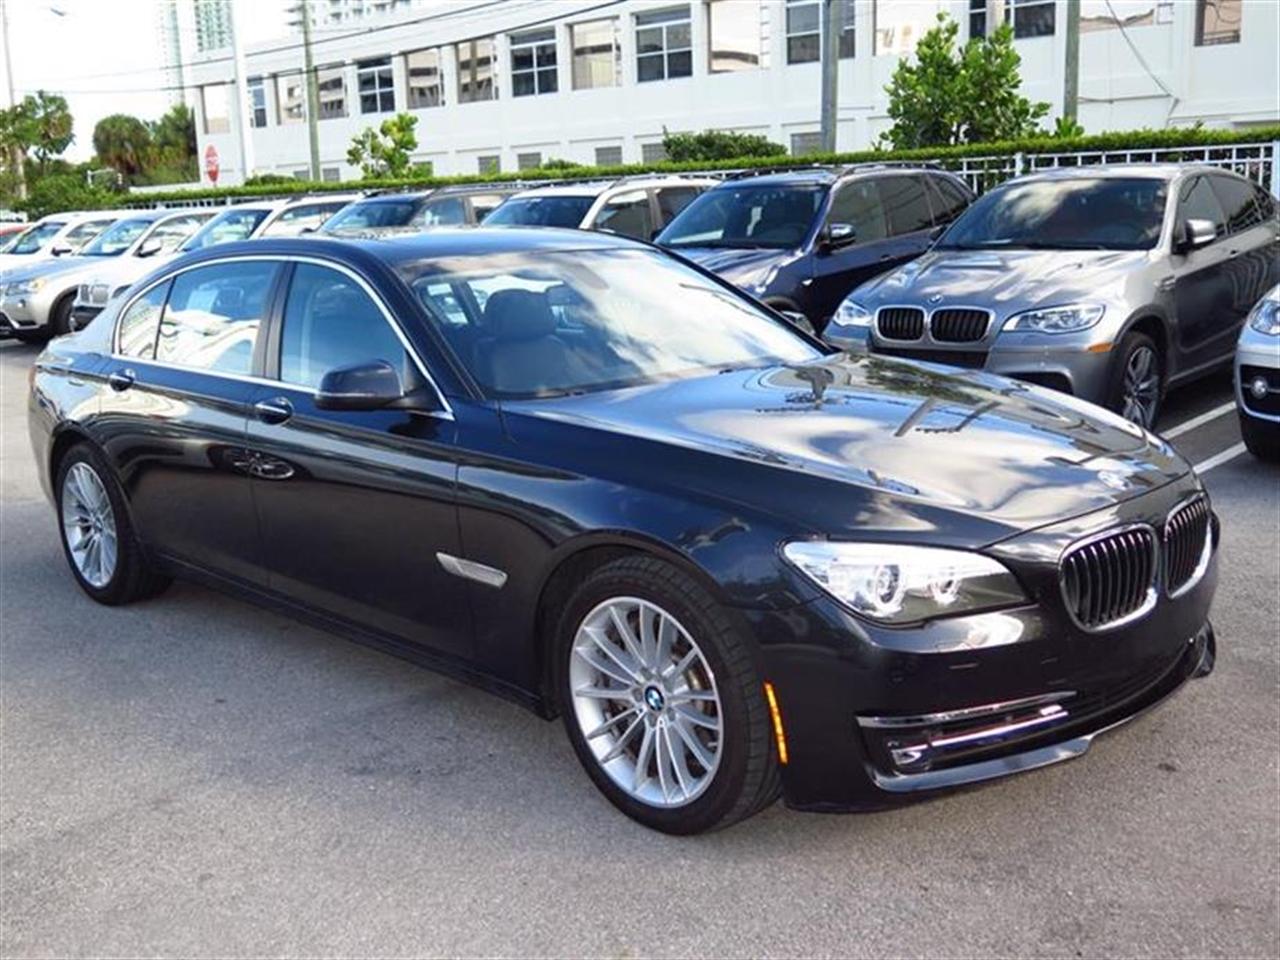 2013 BMW 7 SERIES 4dr Sdn 750Li RWD 37459 miles 4-zone automatic climate control -inc draft-free